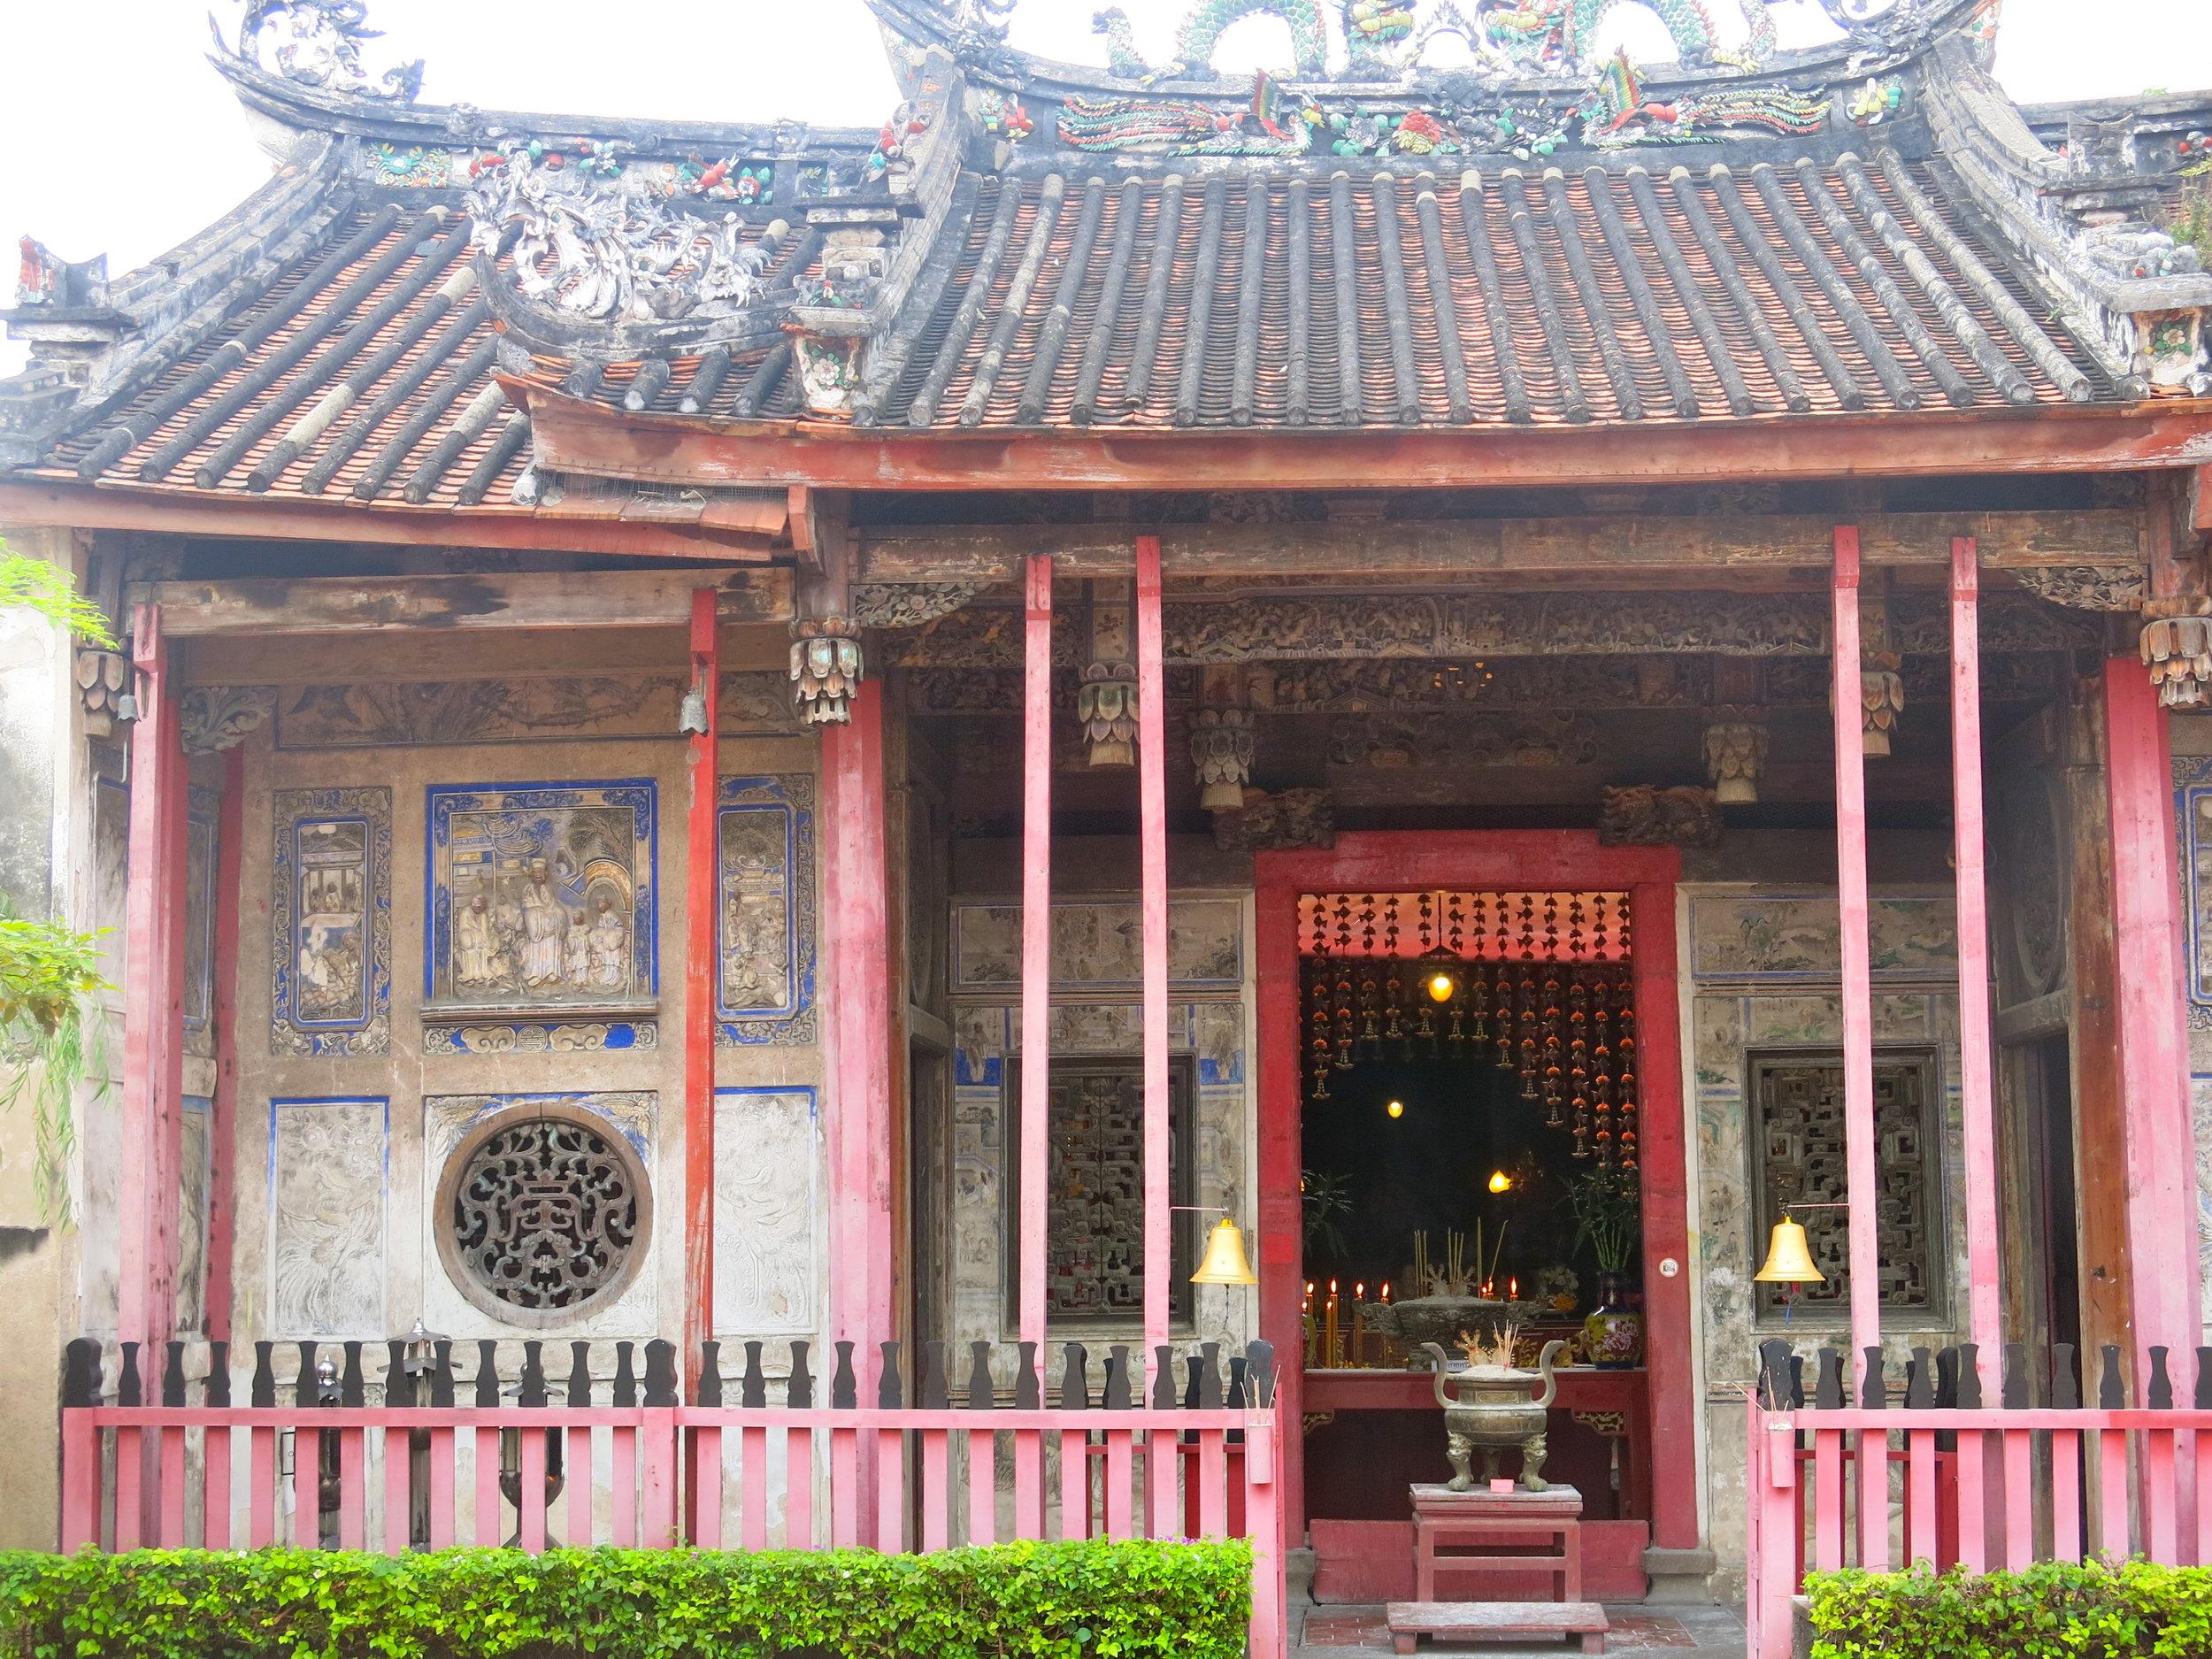 The atmospheric Kuan Yin shrine made of teak wood